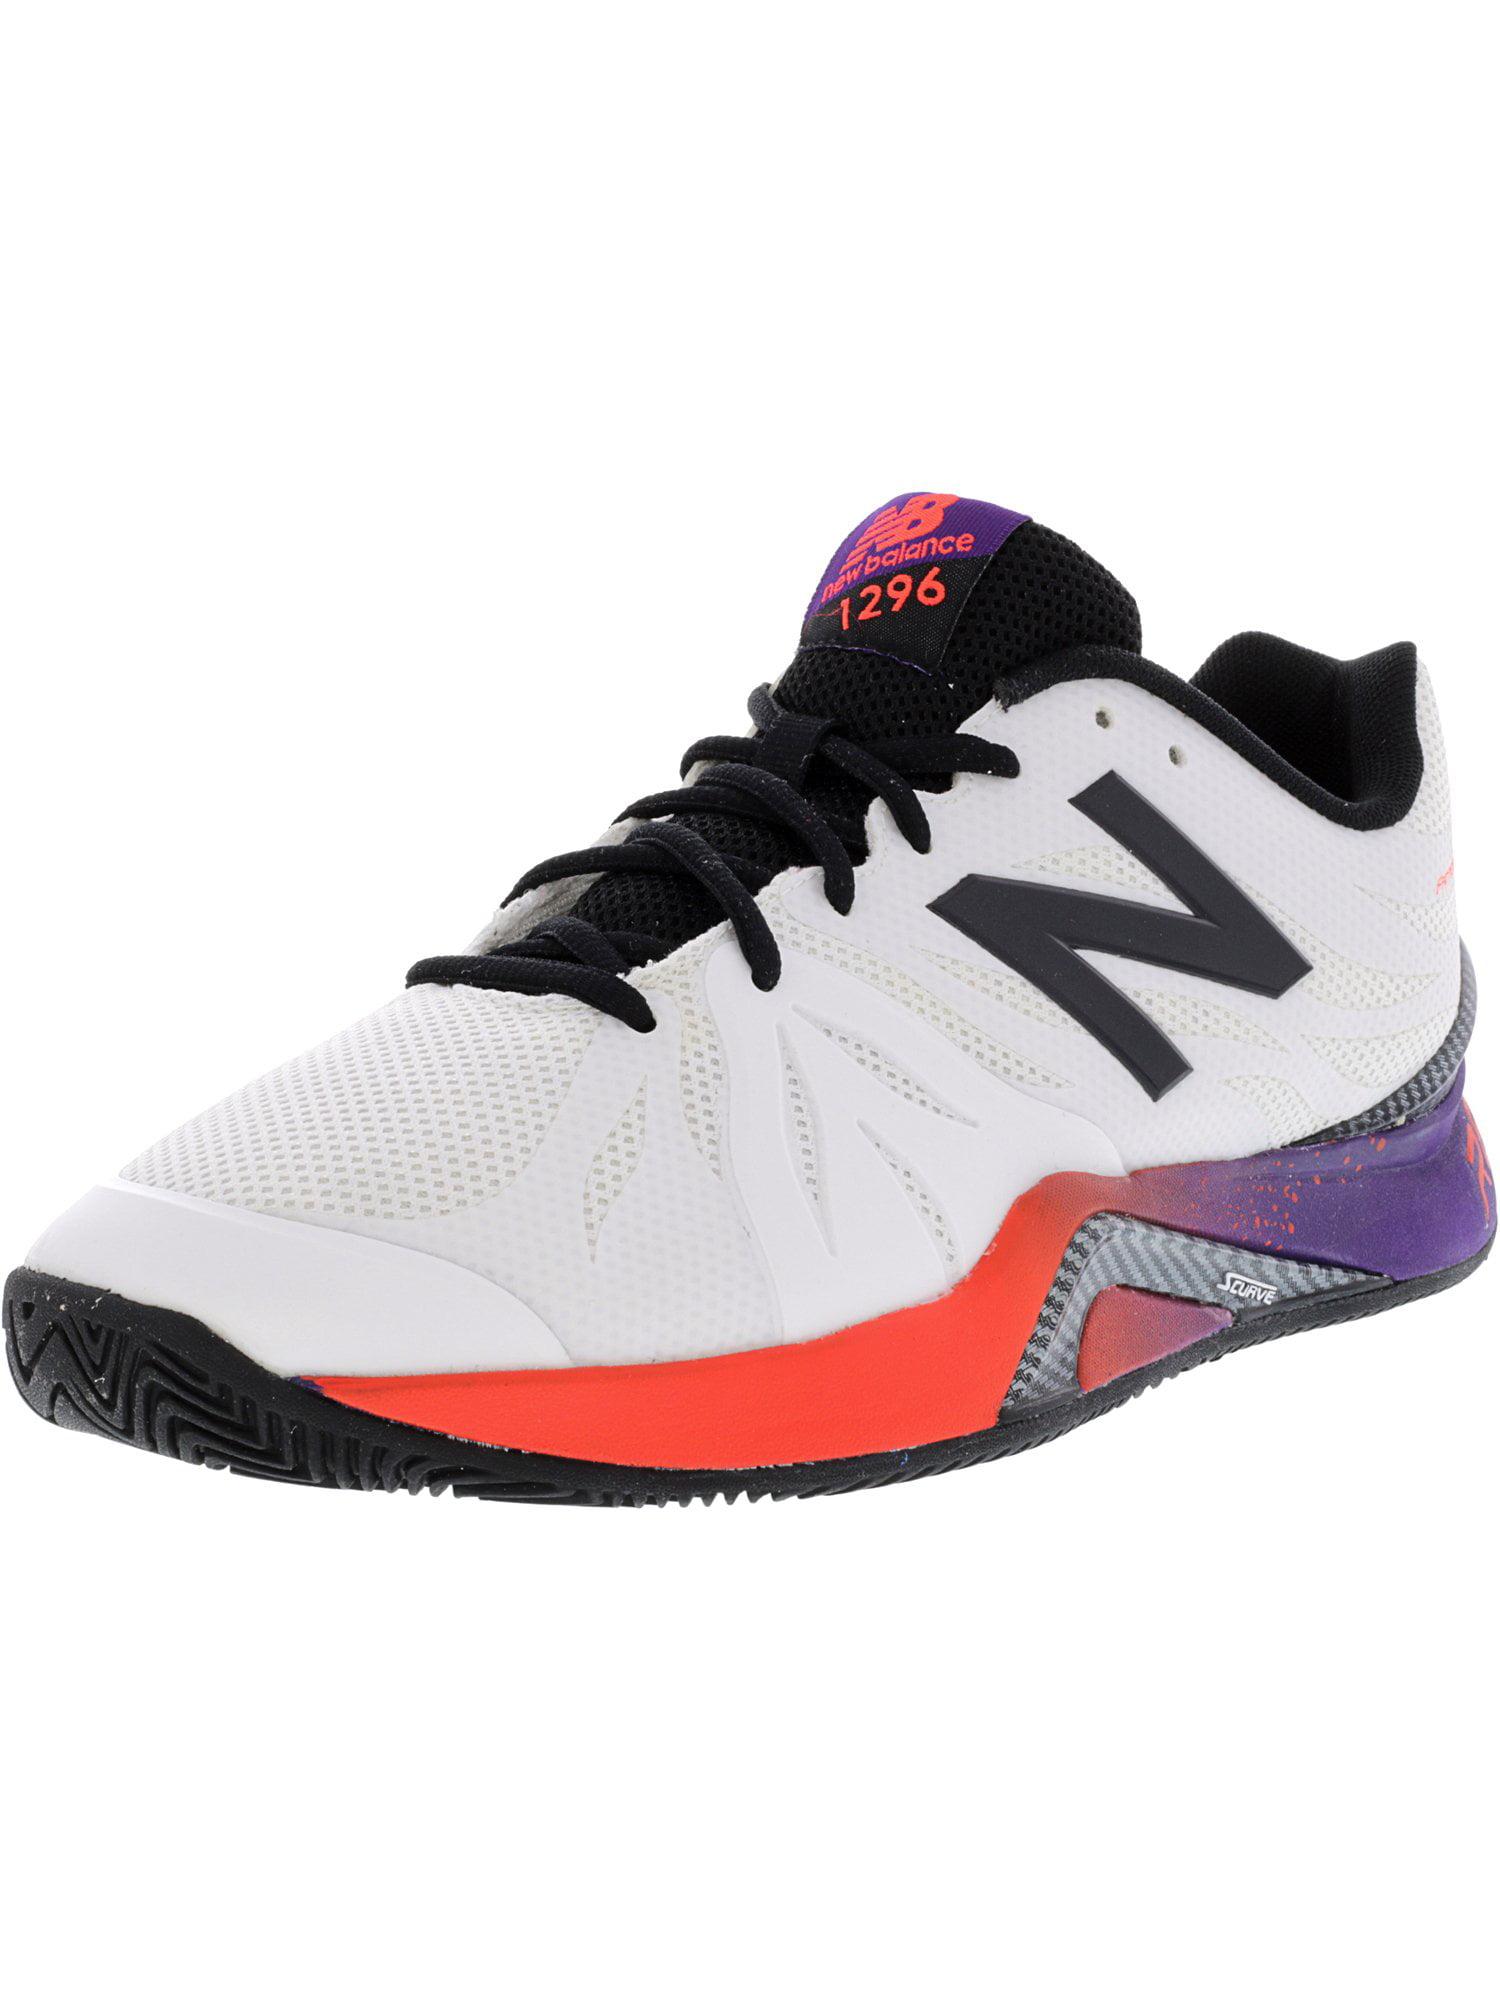 New Balance Men's Mc1296 E2 Ankle-High Tennis Shoe 7WW by New Balance